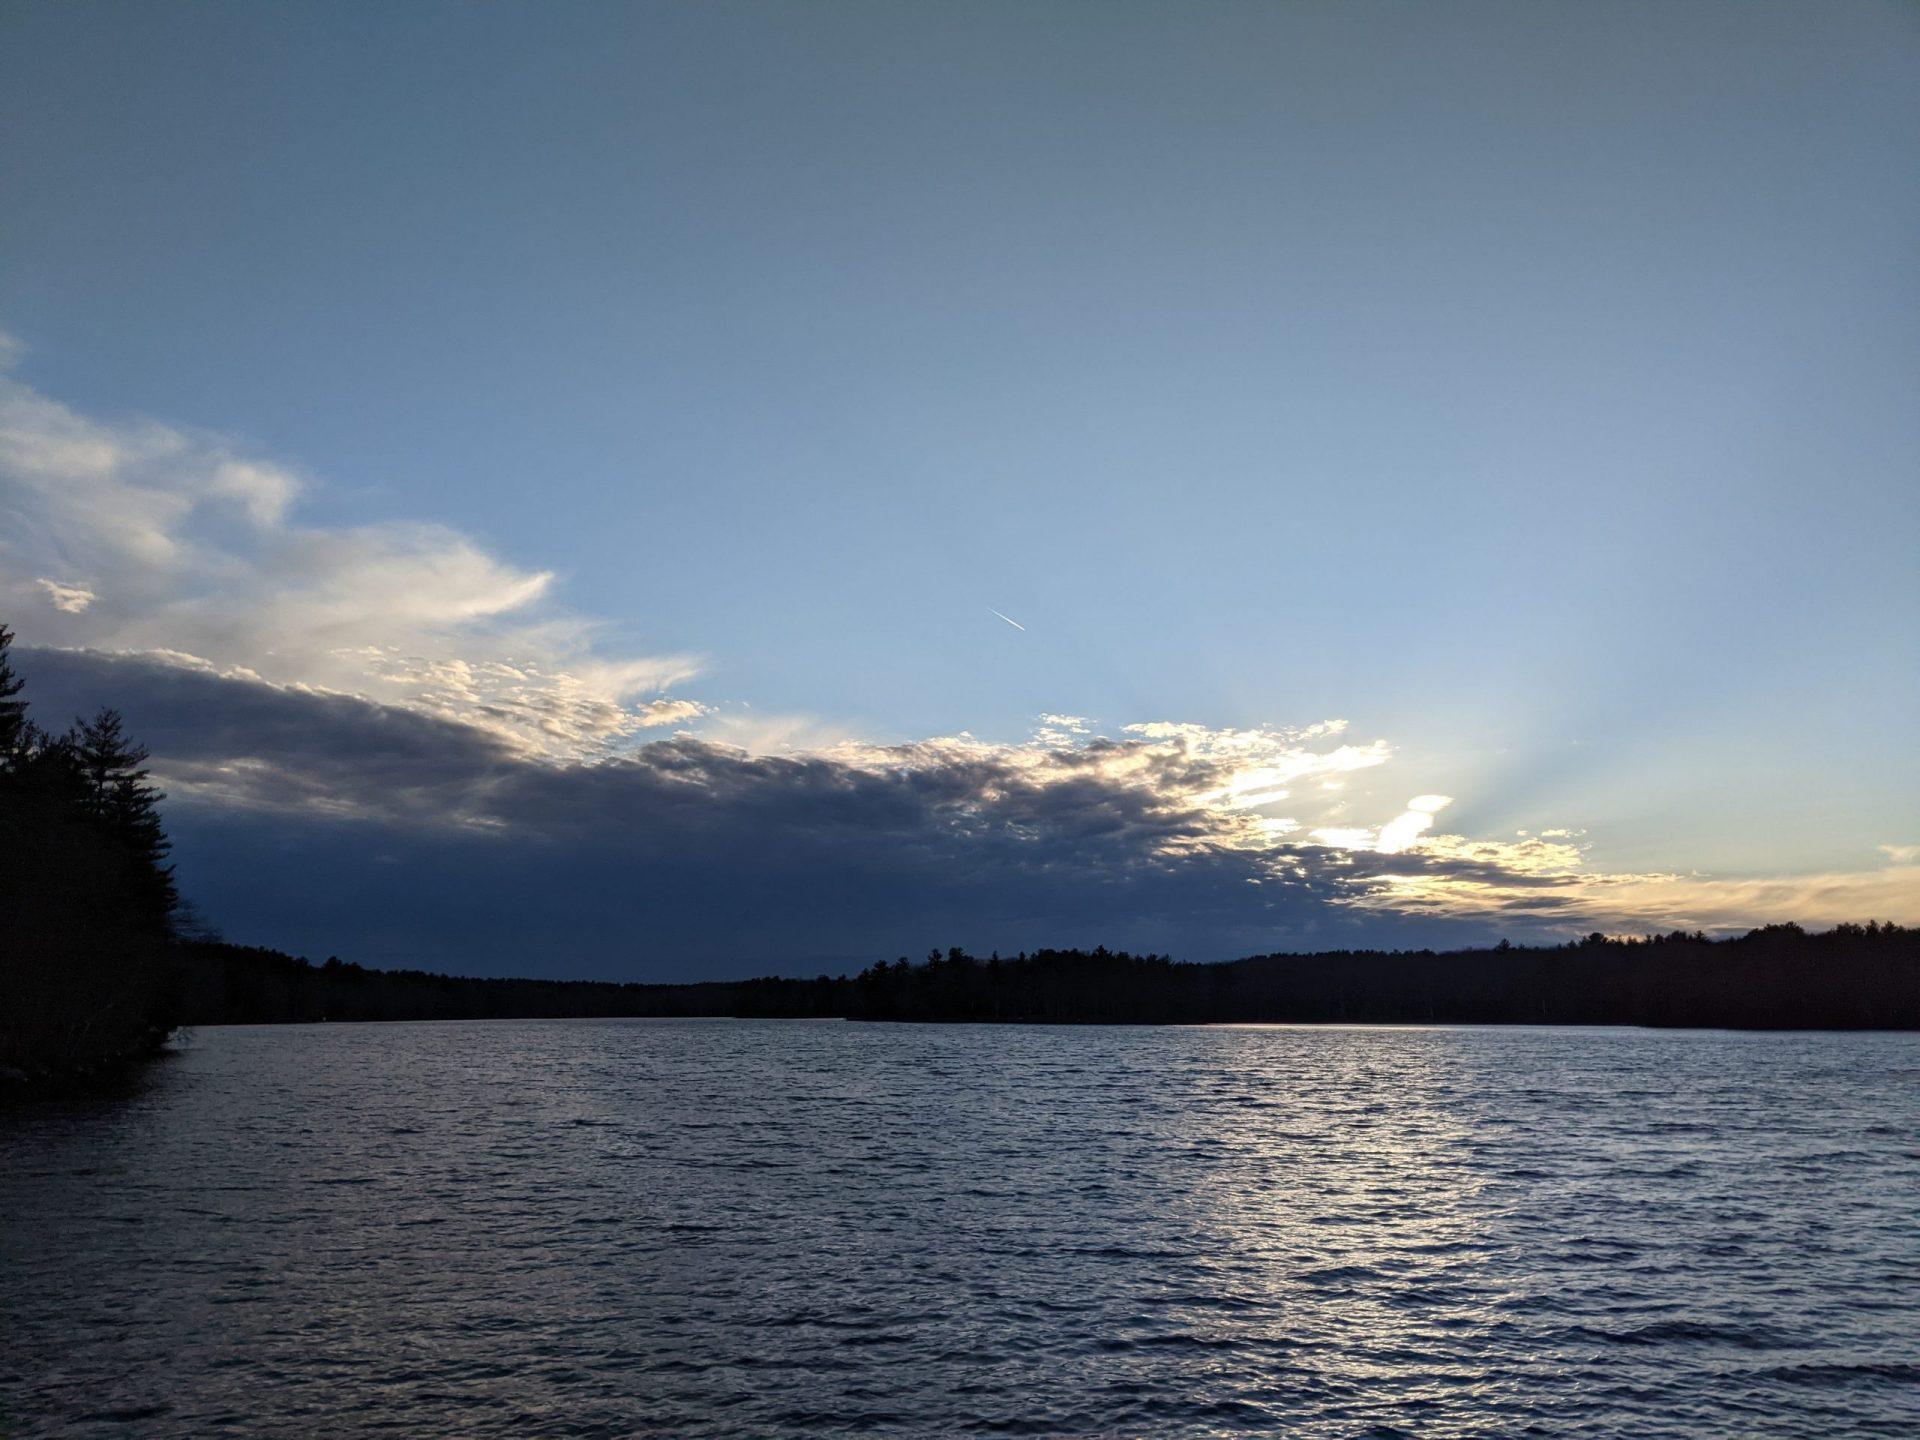 Dec 13, 2020 Ashland State Park